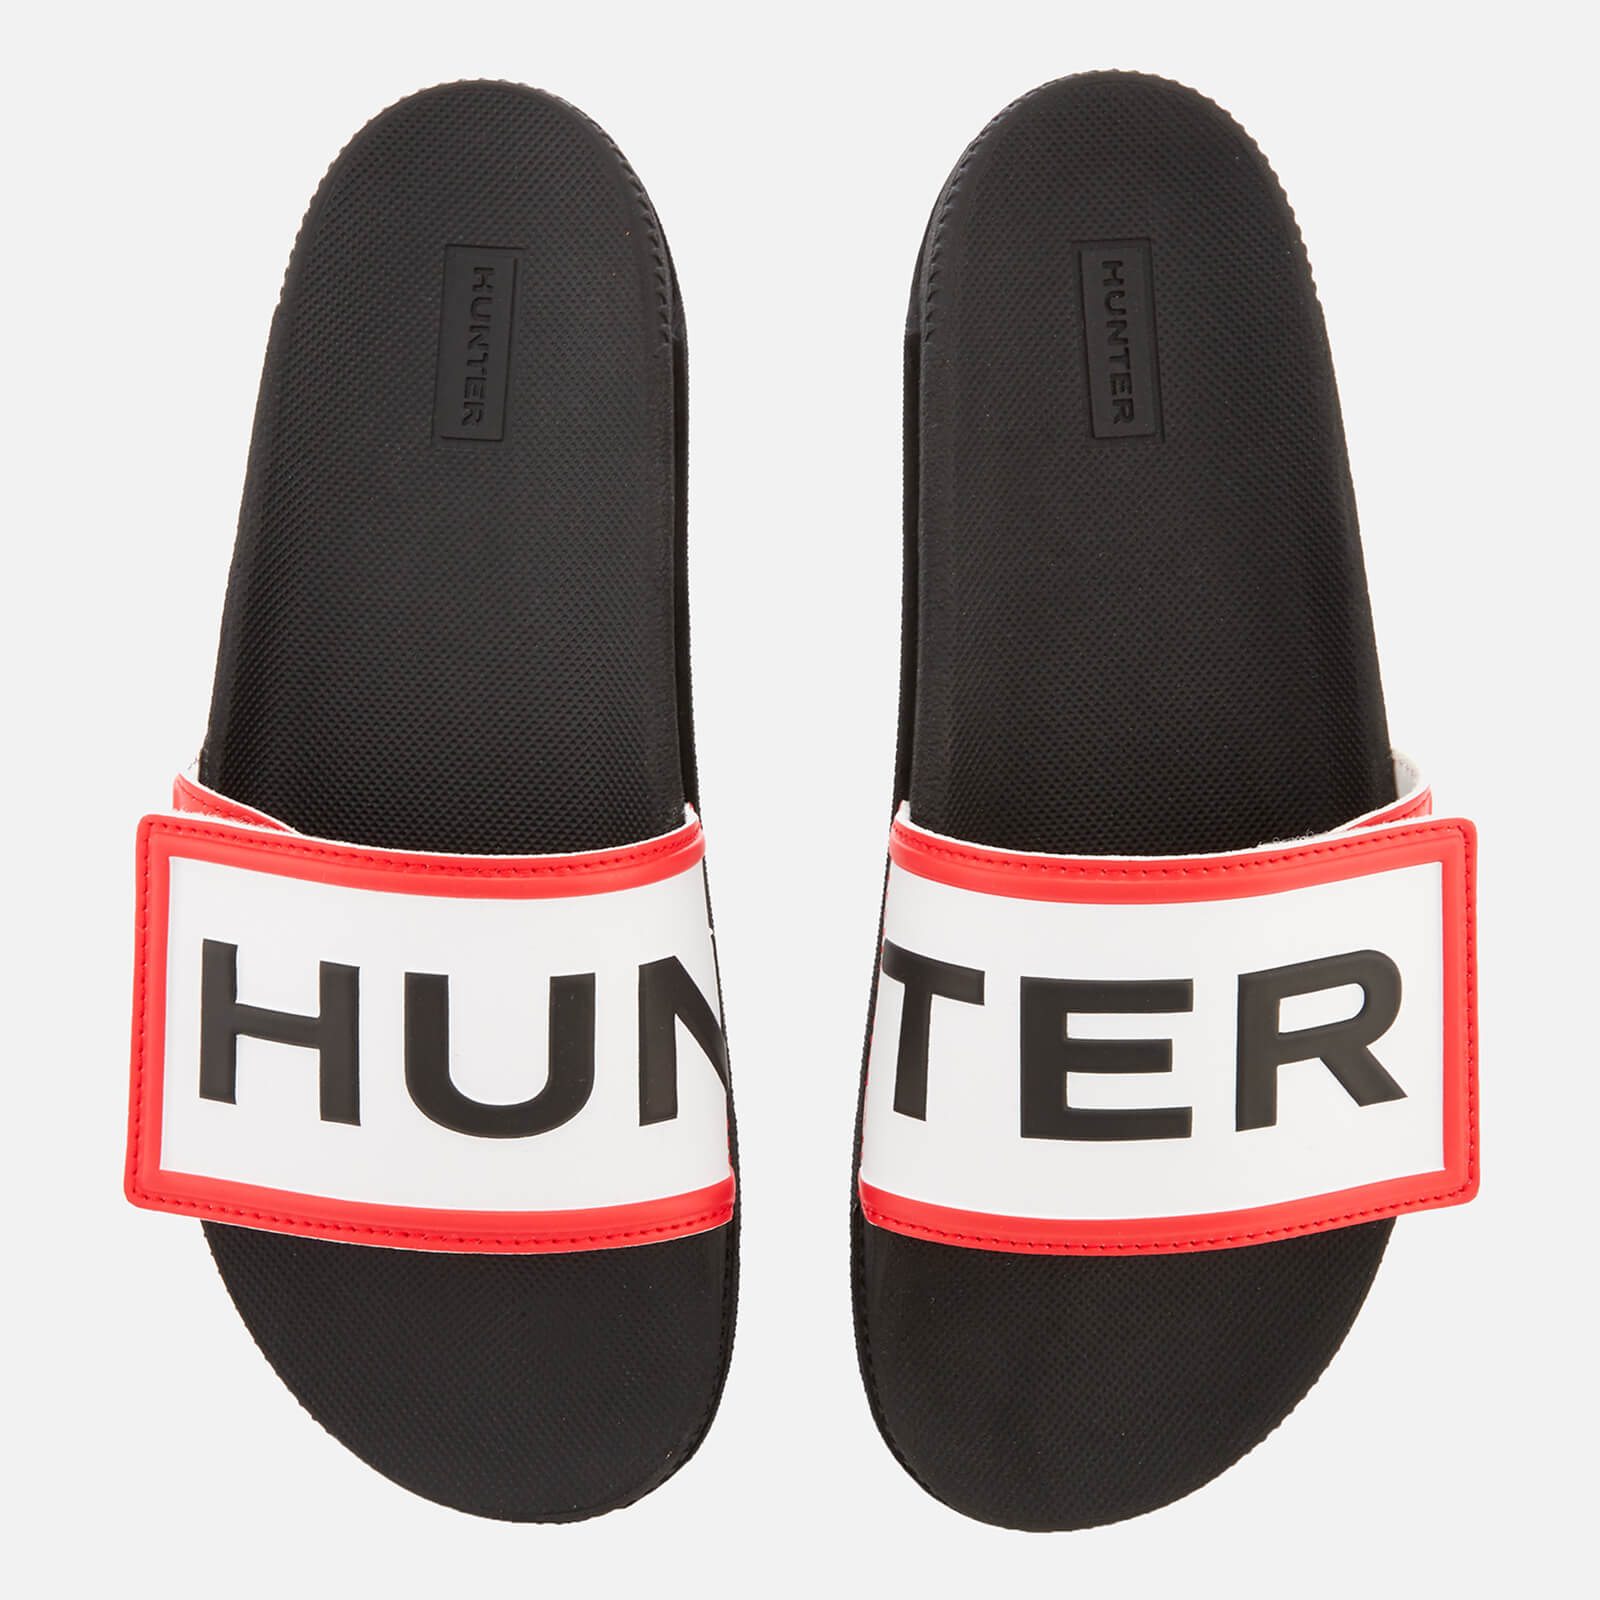 5e07023f338cb3 Hunter Women s Original Adjustable Logo Slide Sandals - Black